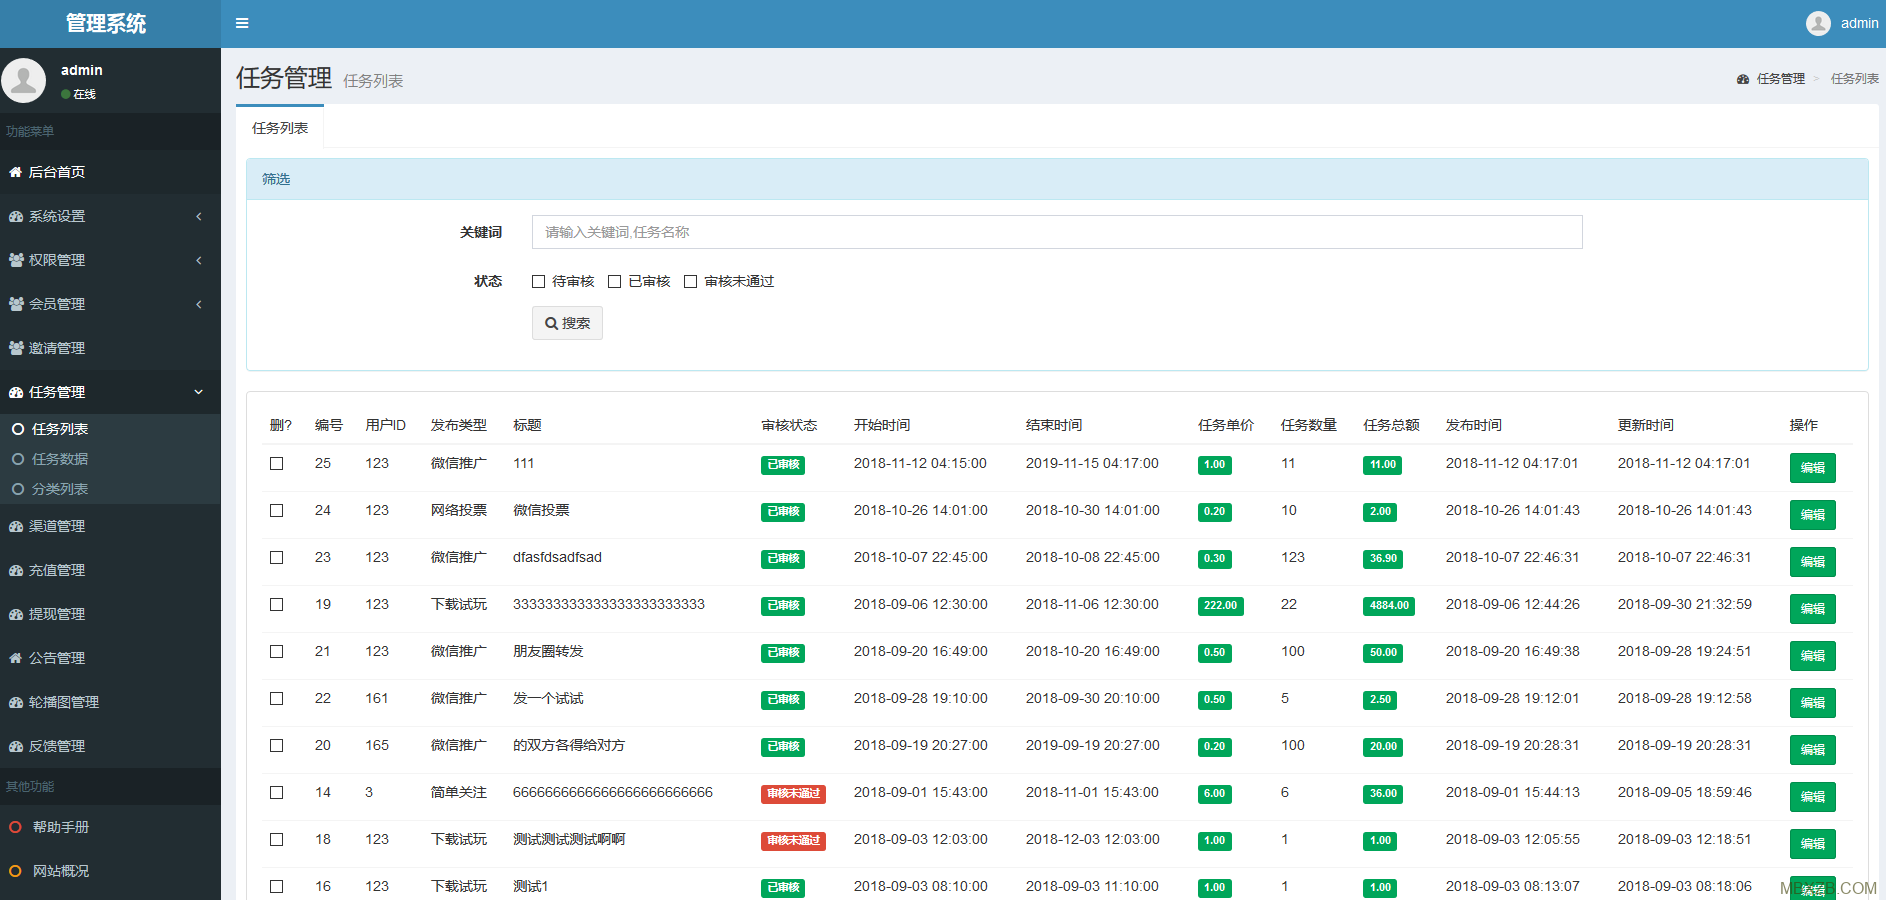 Thinkphp5新威客任务平台源码,做任务赚佣金任务平台(修复BUG)